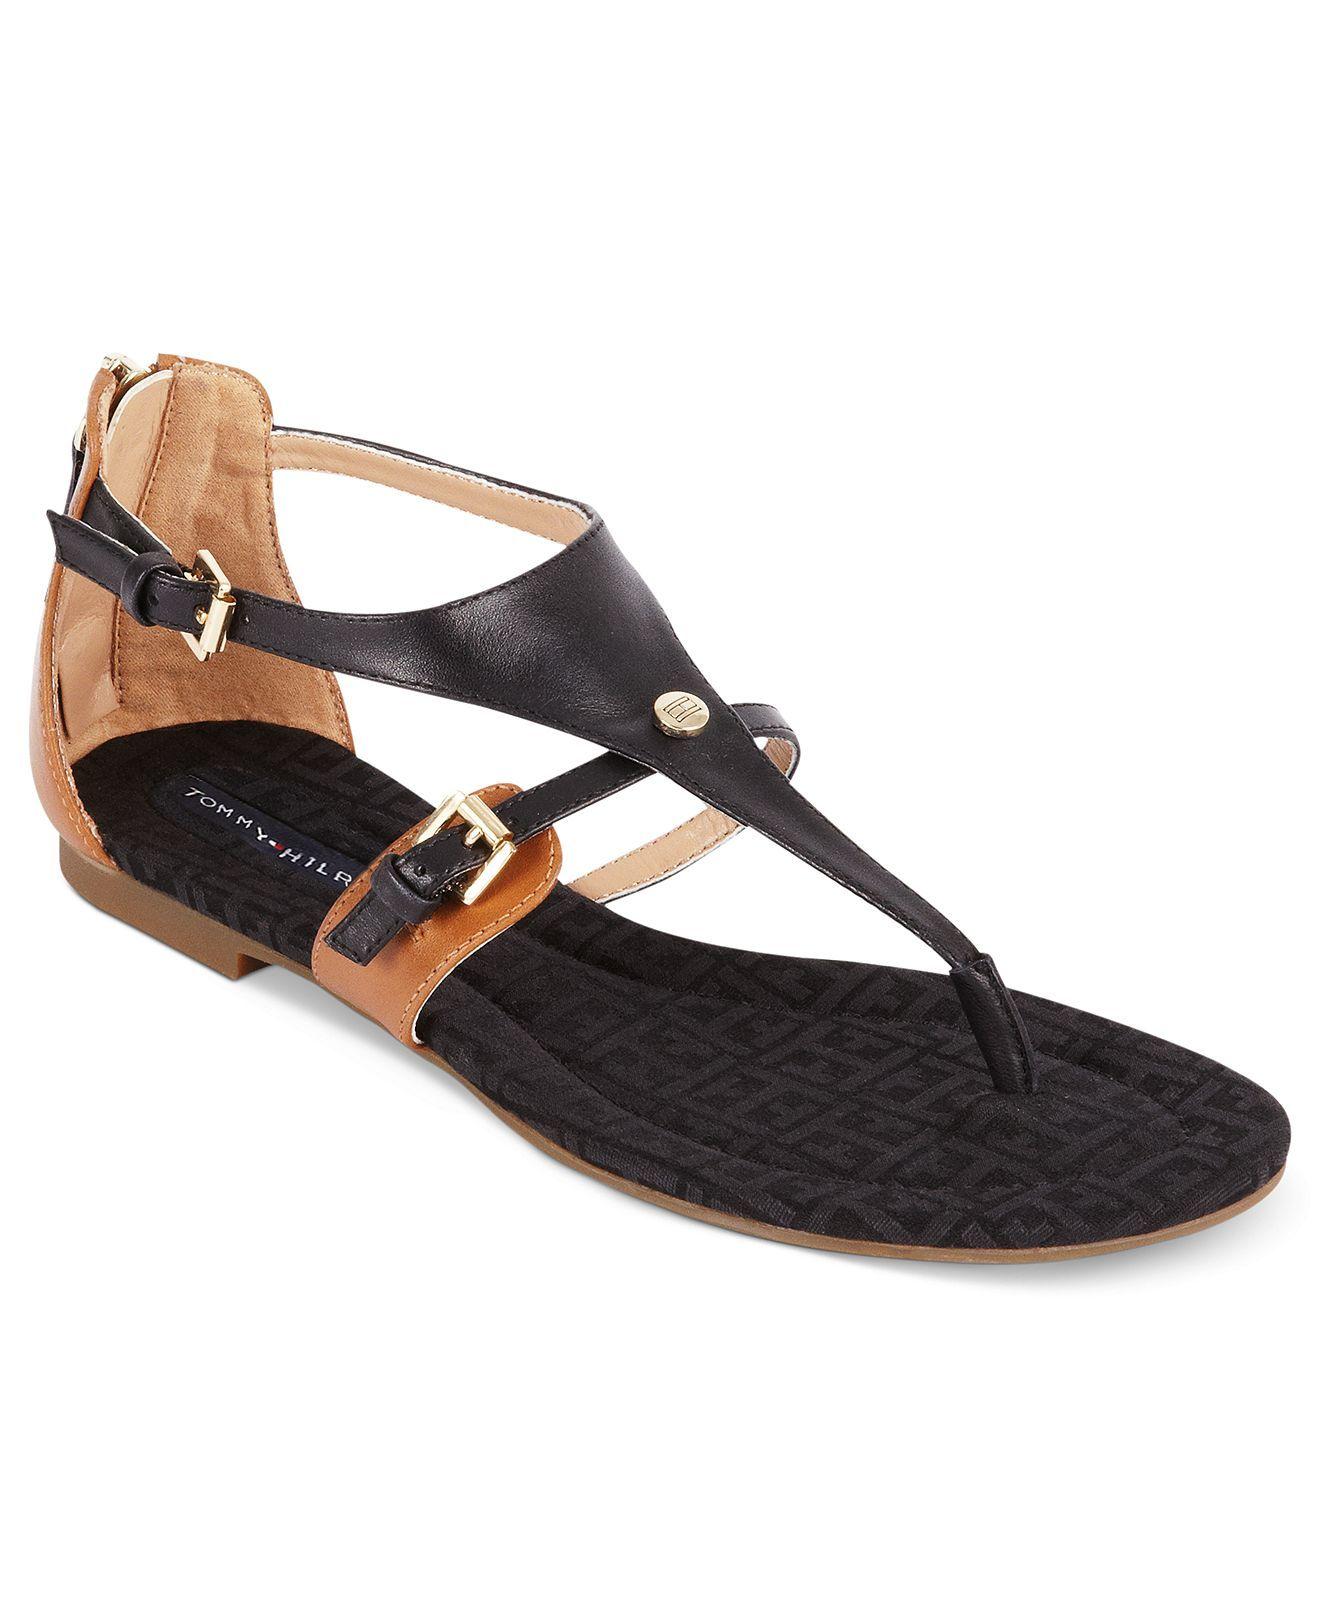 New Trendy Volatile Rainboom Open Toe Canvas Multi Color Thong Sandal Multiple Colors For Women Online